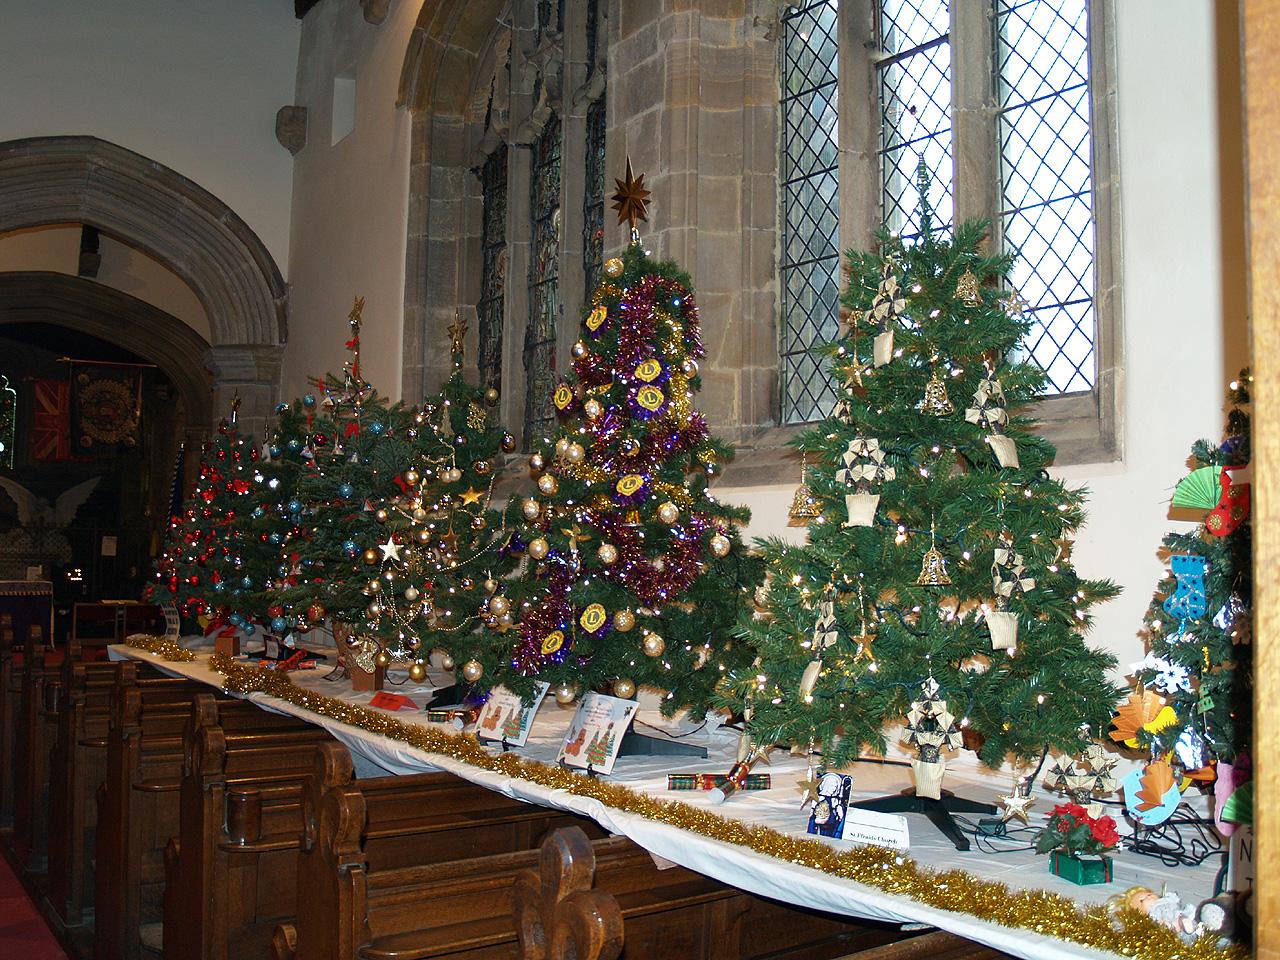 Roman Catholic Church Christmas Pine Trees